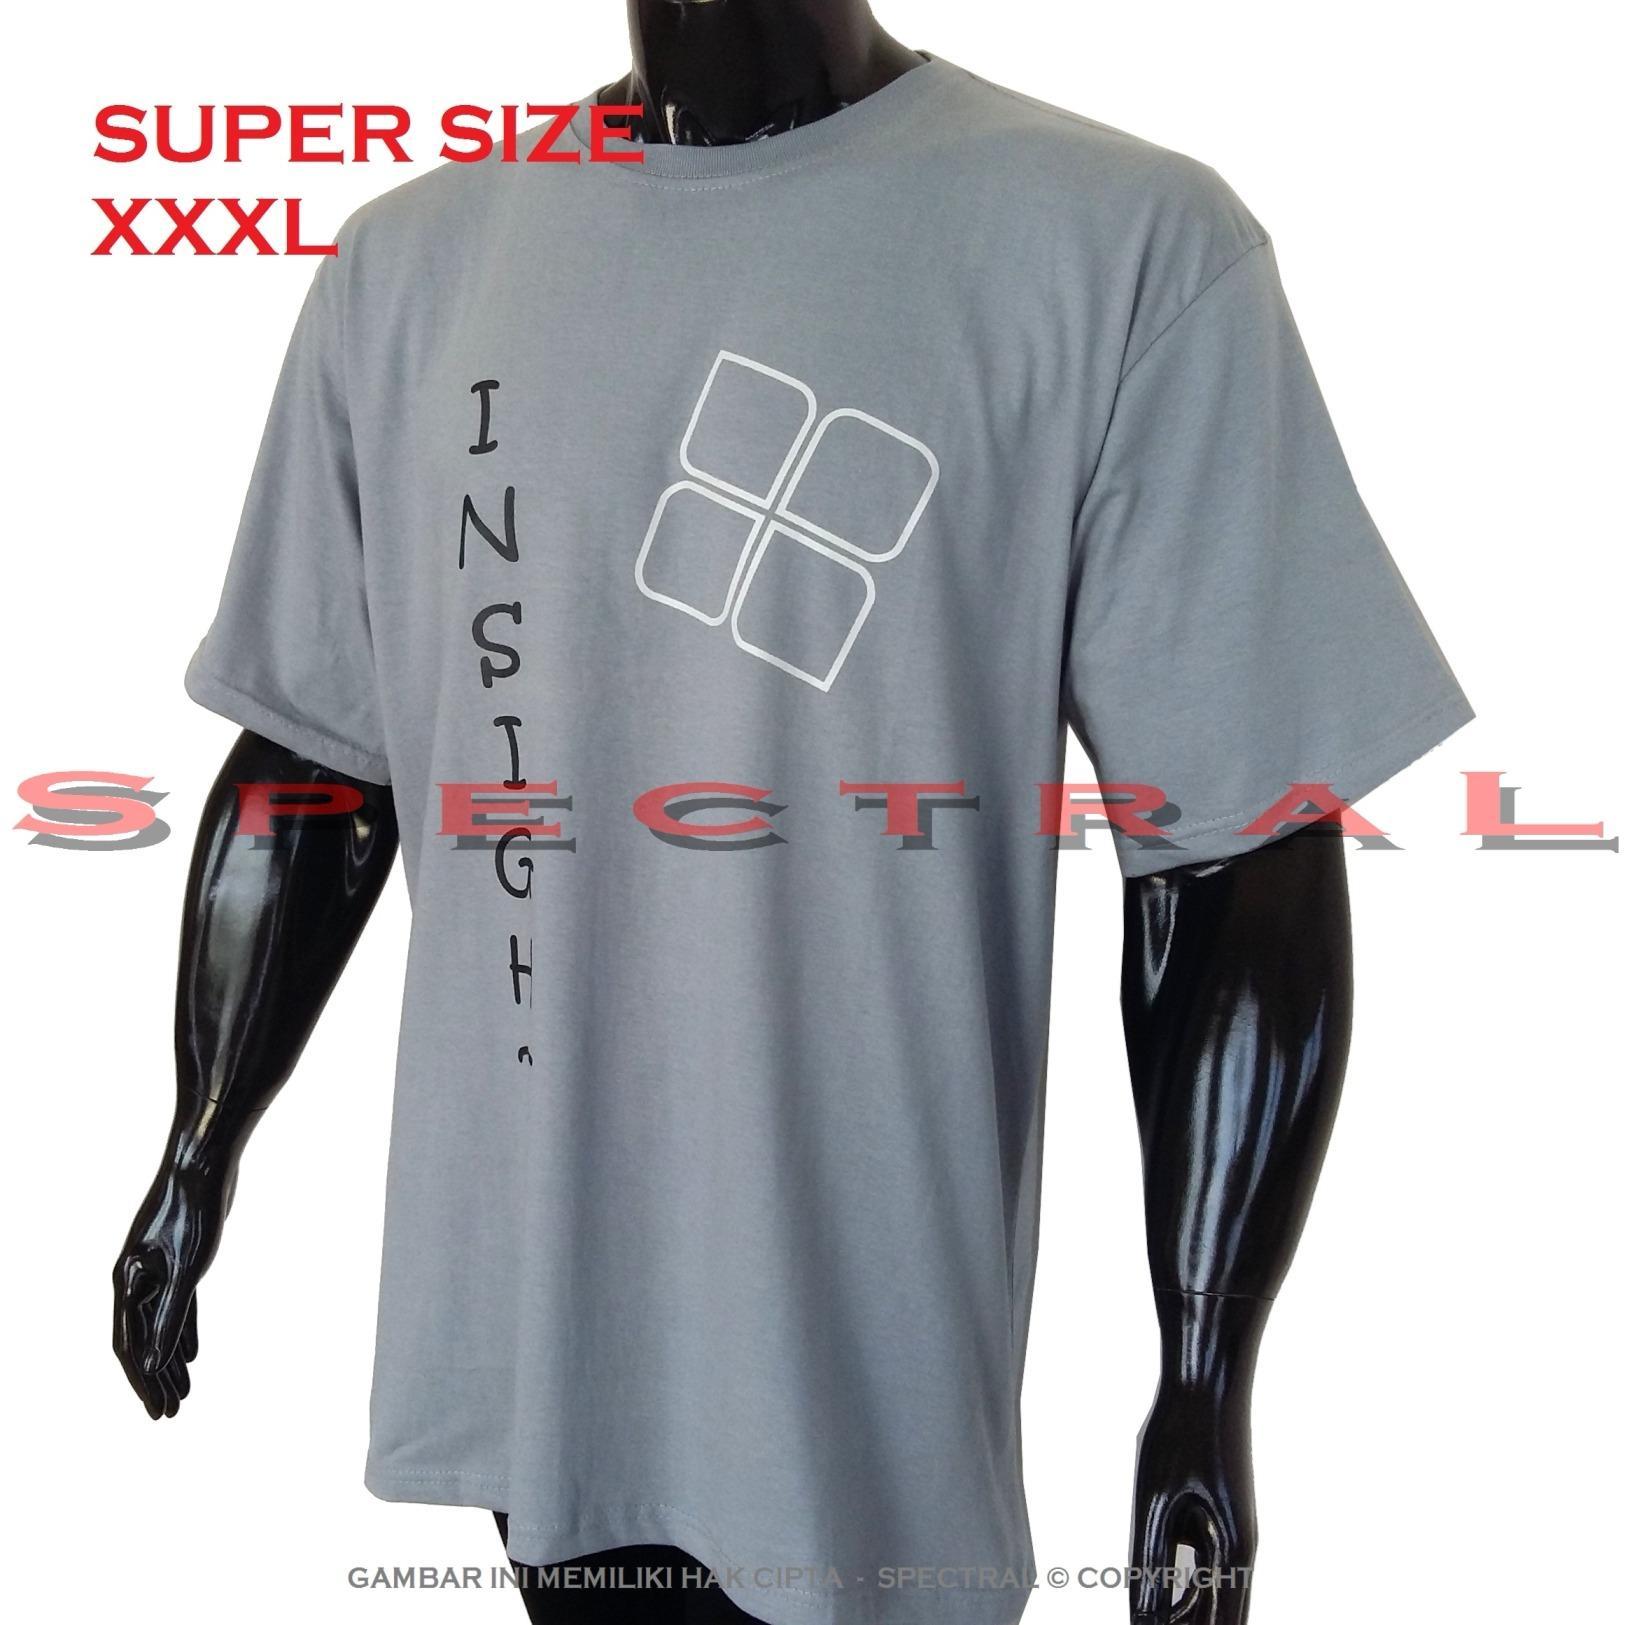 Spectral – 3XL SUPER BIG SIZE XXXL 100{55e037da9a70d2f692182bf73e9ad7c46940d20c7297ef2687c837f7bdb7b002} Cotton Combed Kaos Distro Jumbo BIGSIZE T-Shirt Fashion Ukuran Besar Polos Celana Atasan Pria Wanita Katun Bapak Orang Tua Gemuk Gendut Simple Sport Casual Halus Baju Cowo Cewe Pakaian Super Size 3L INSIGHT 4 ABMUDA